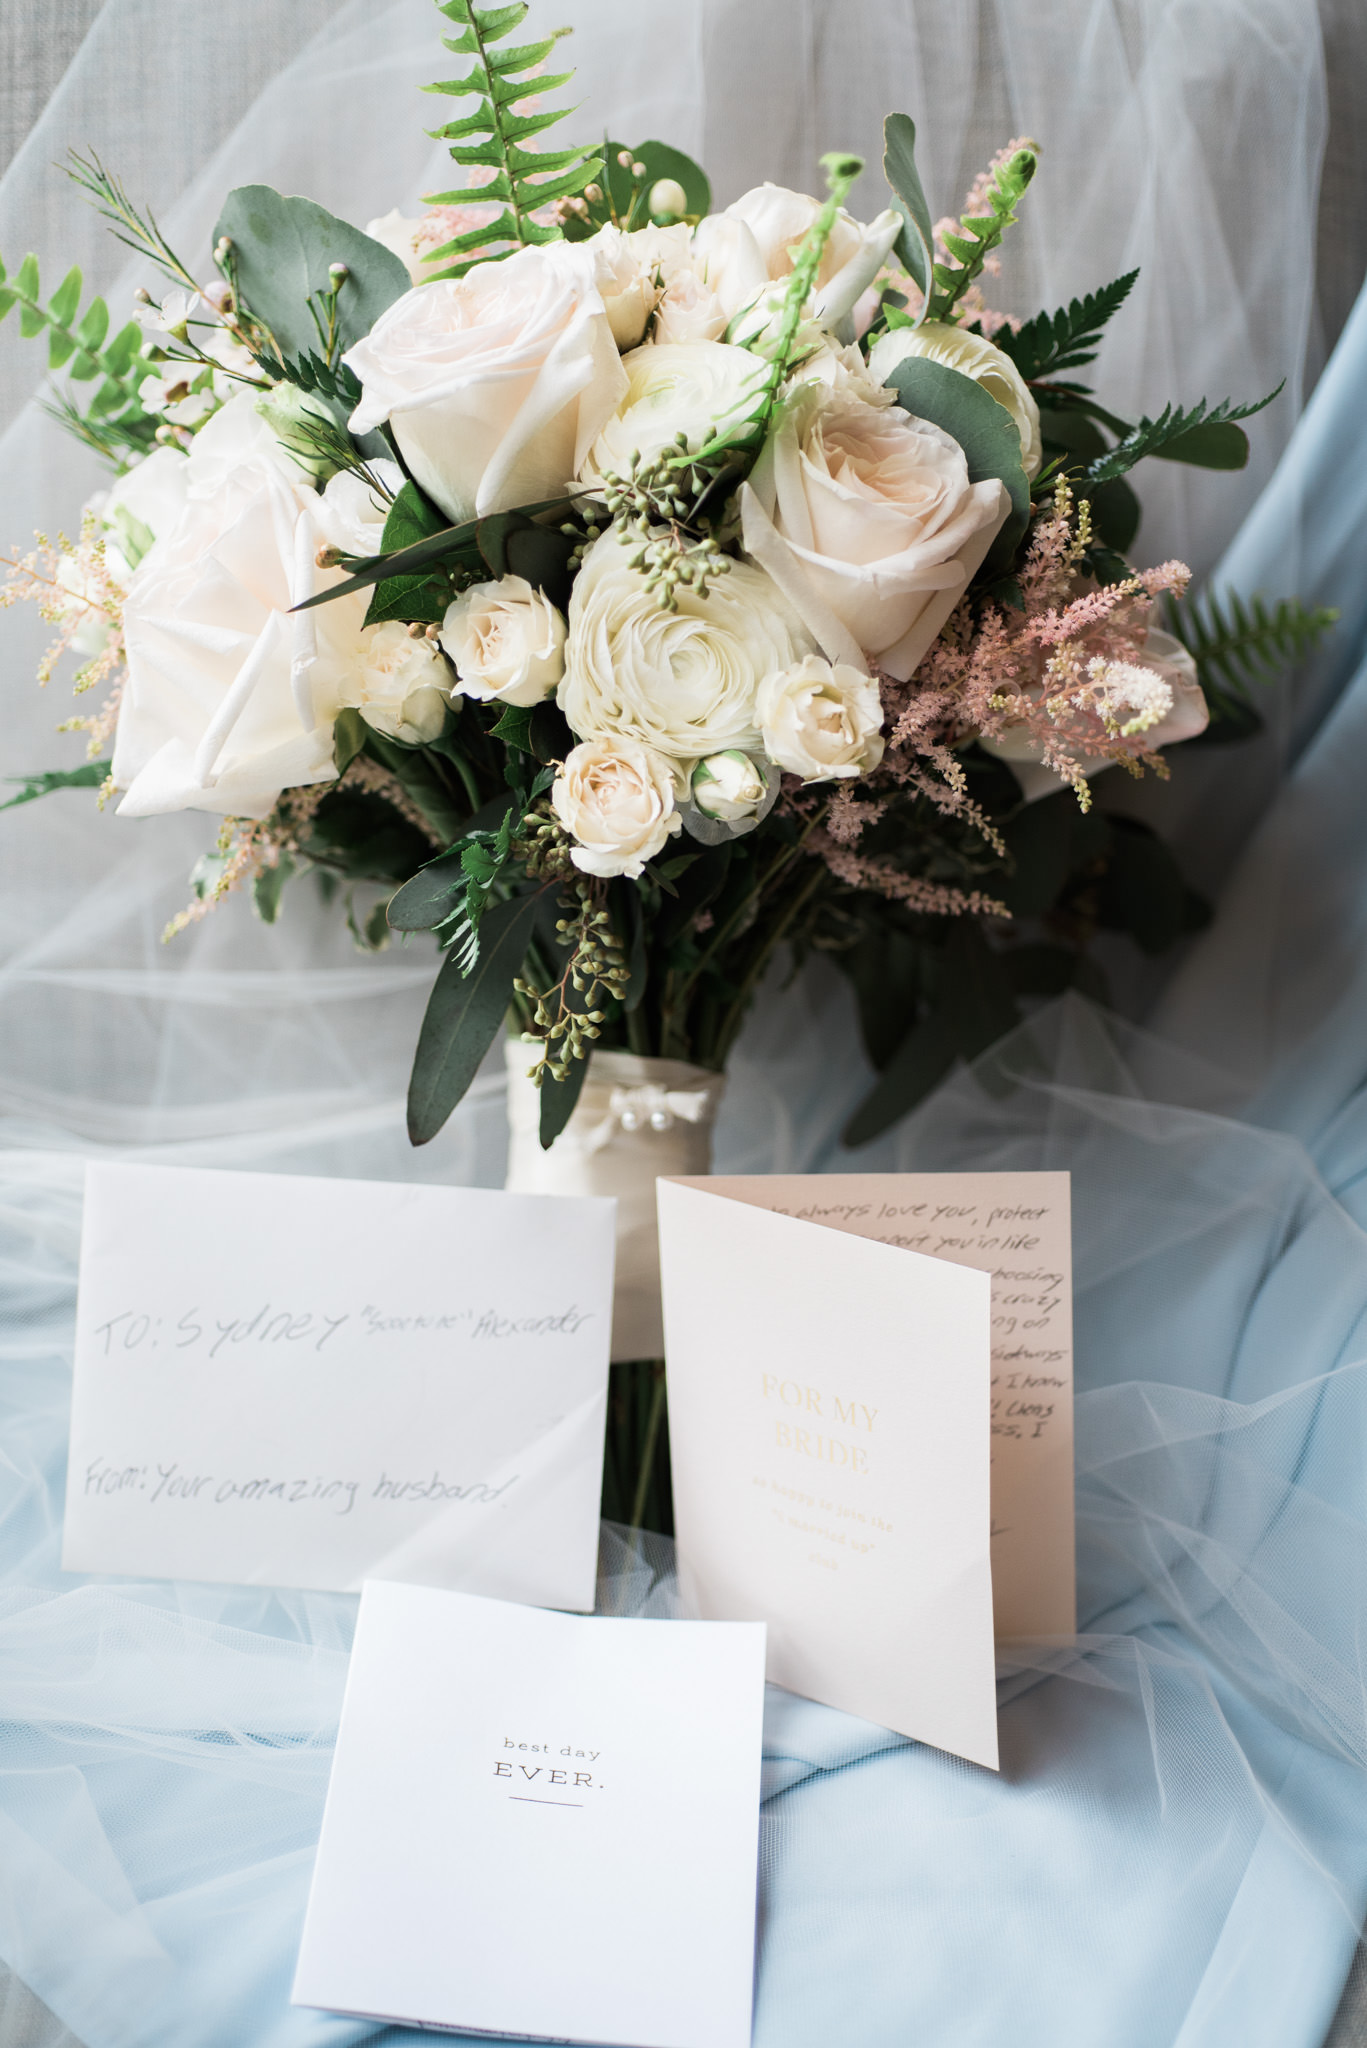 Athens-wedding-bouquet-3.jpg